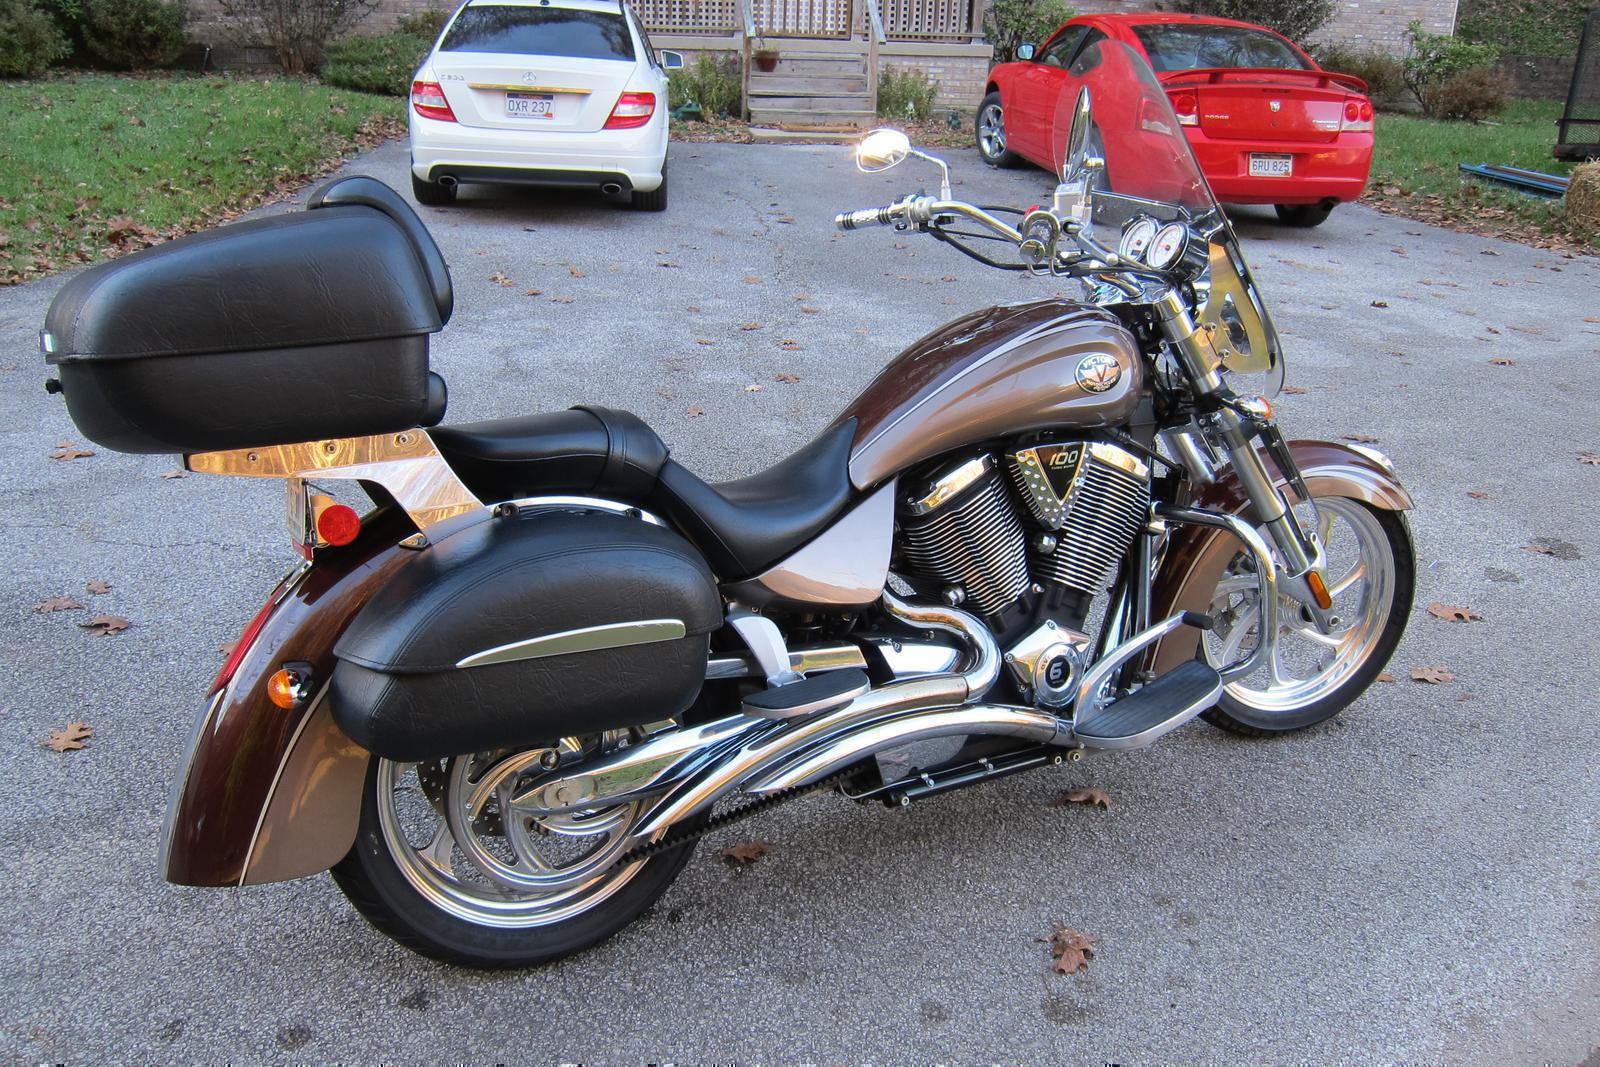 Used Inventory Blizzard S Custom Cycle Atv Charleston Wv 304